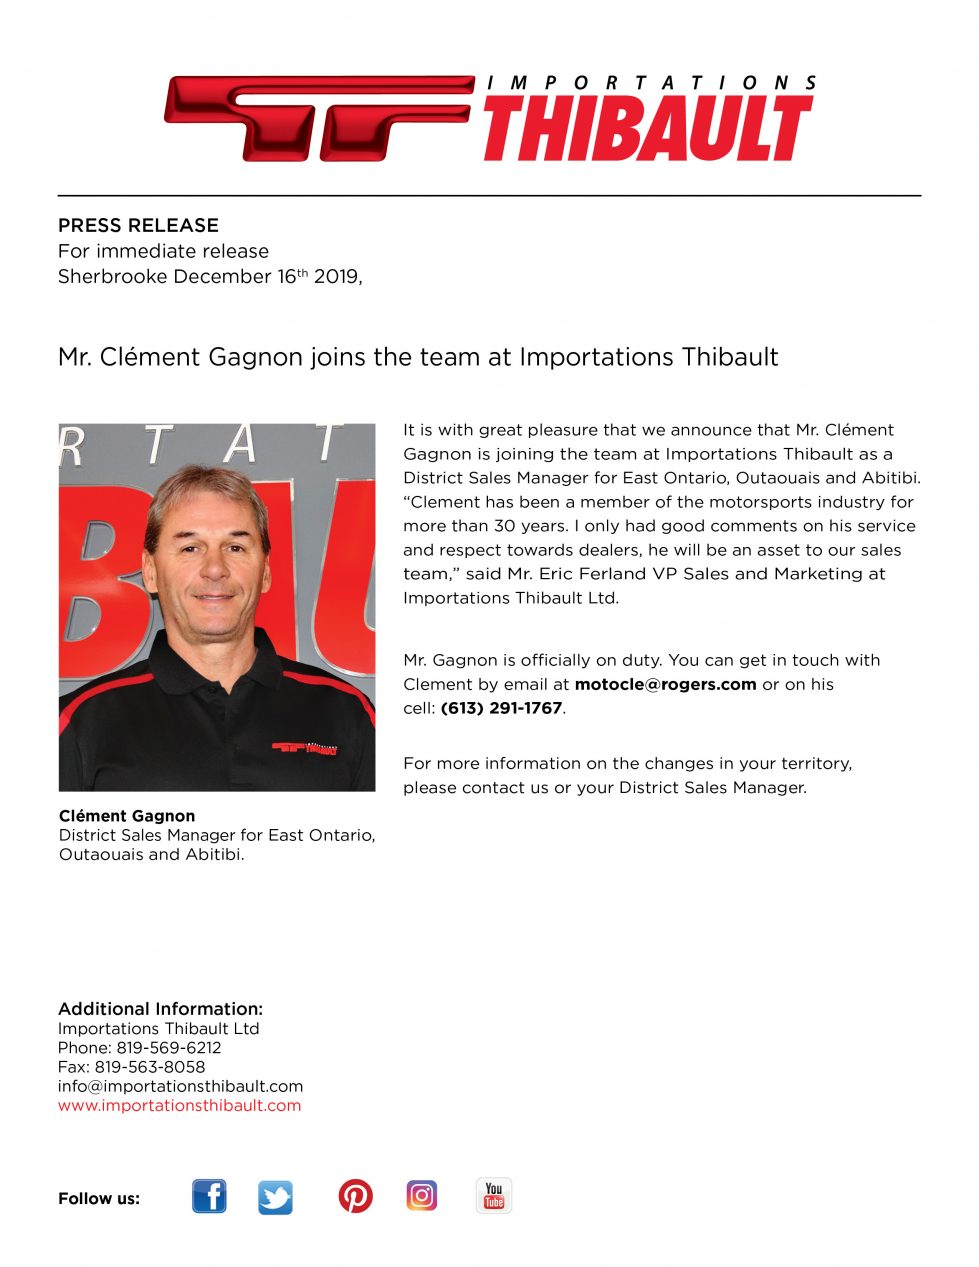 Mr Clément Gagnon joins the Importations Thibault team.